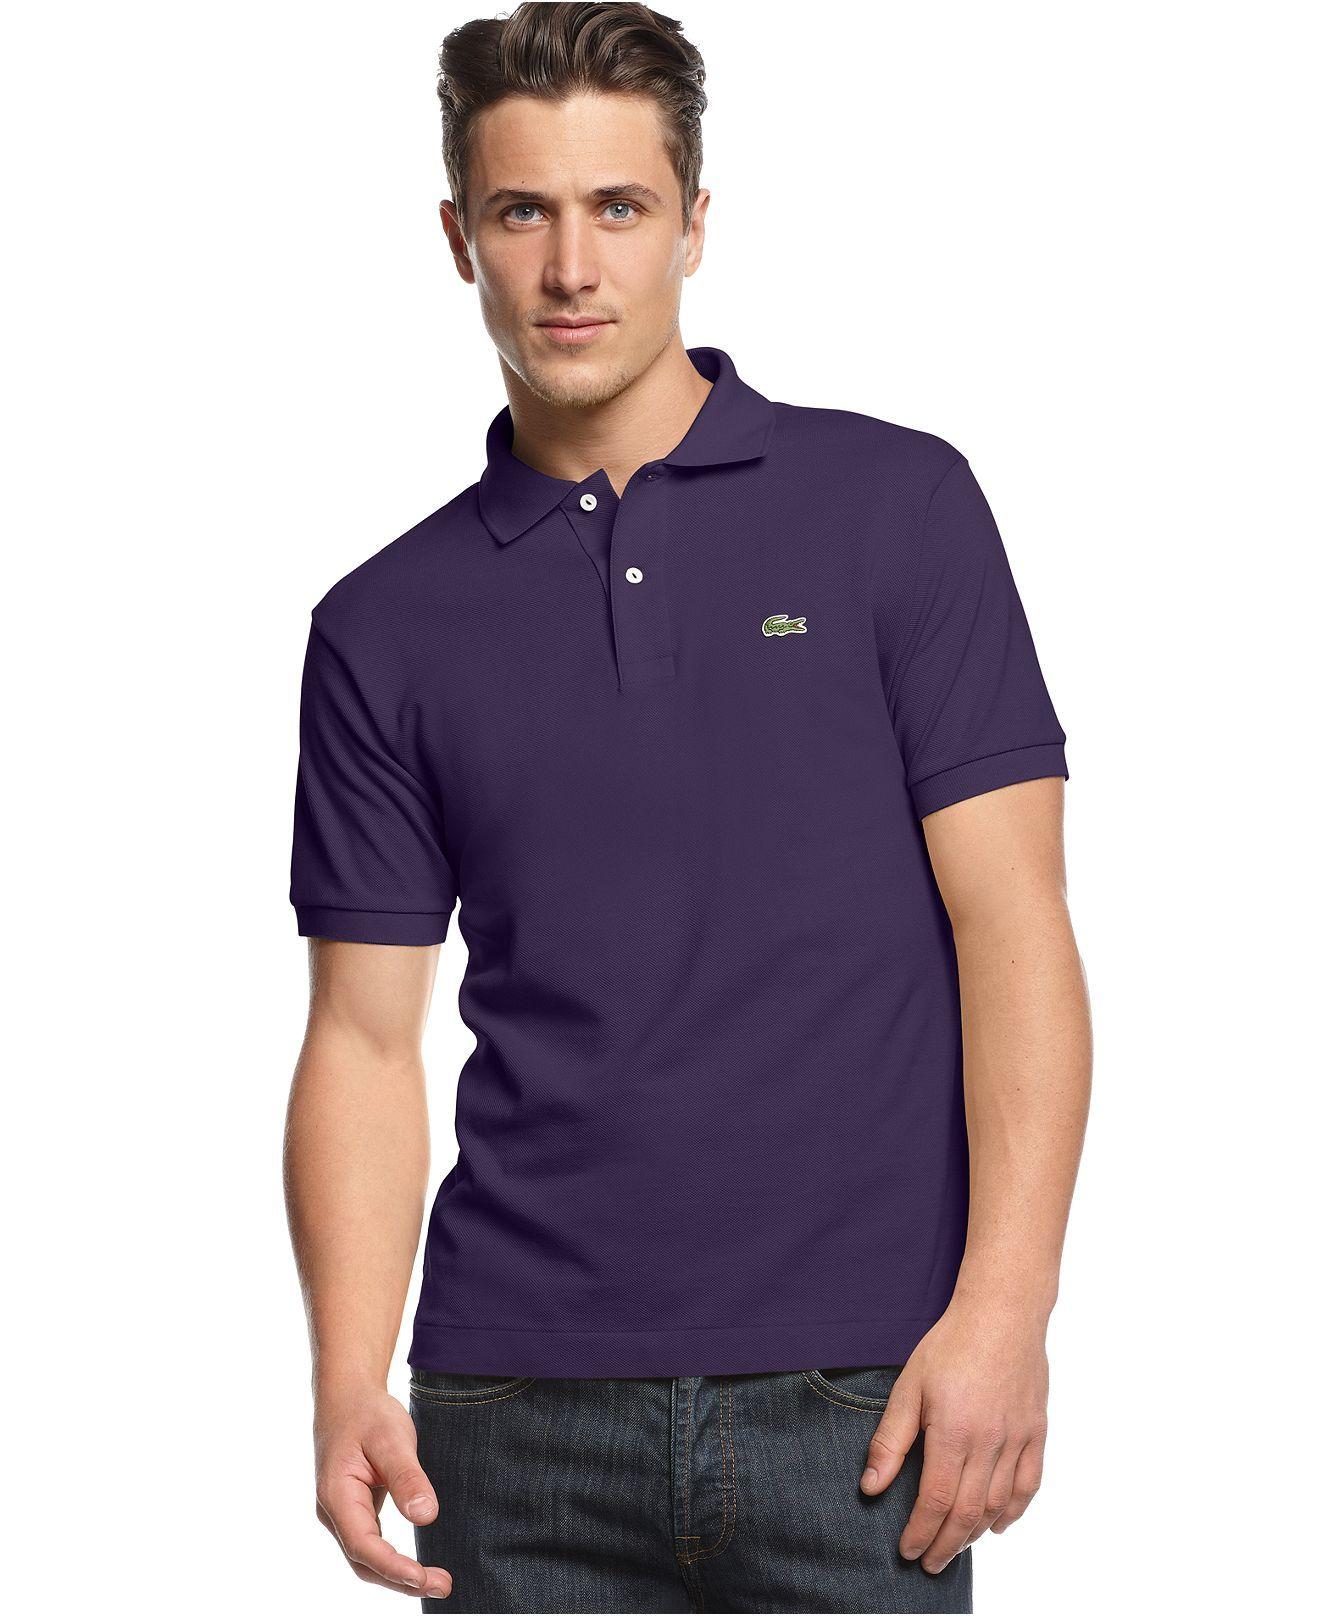 0715fb9fca08 Lacoste Shirt